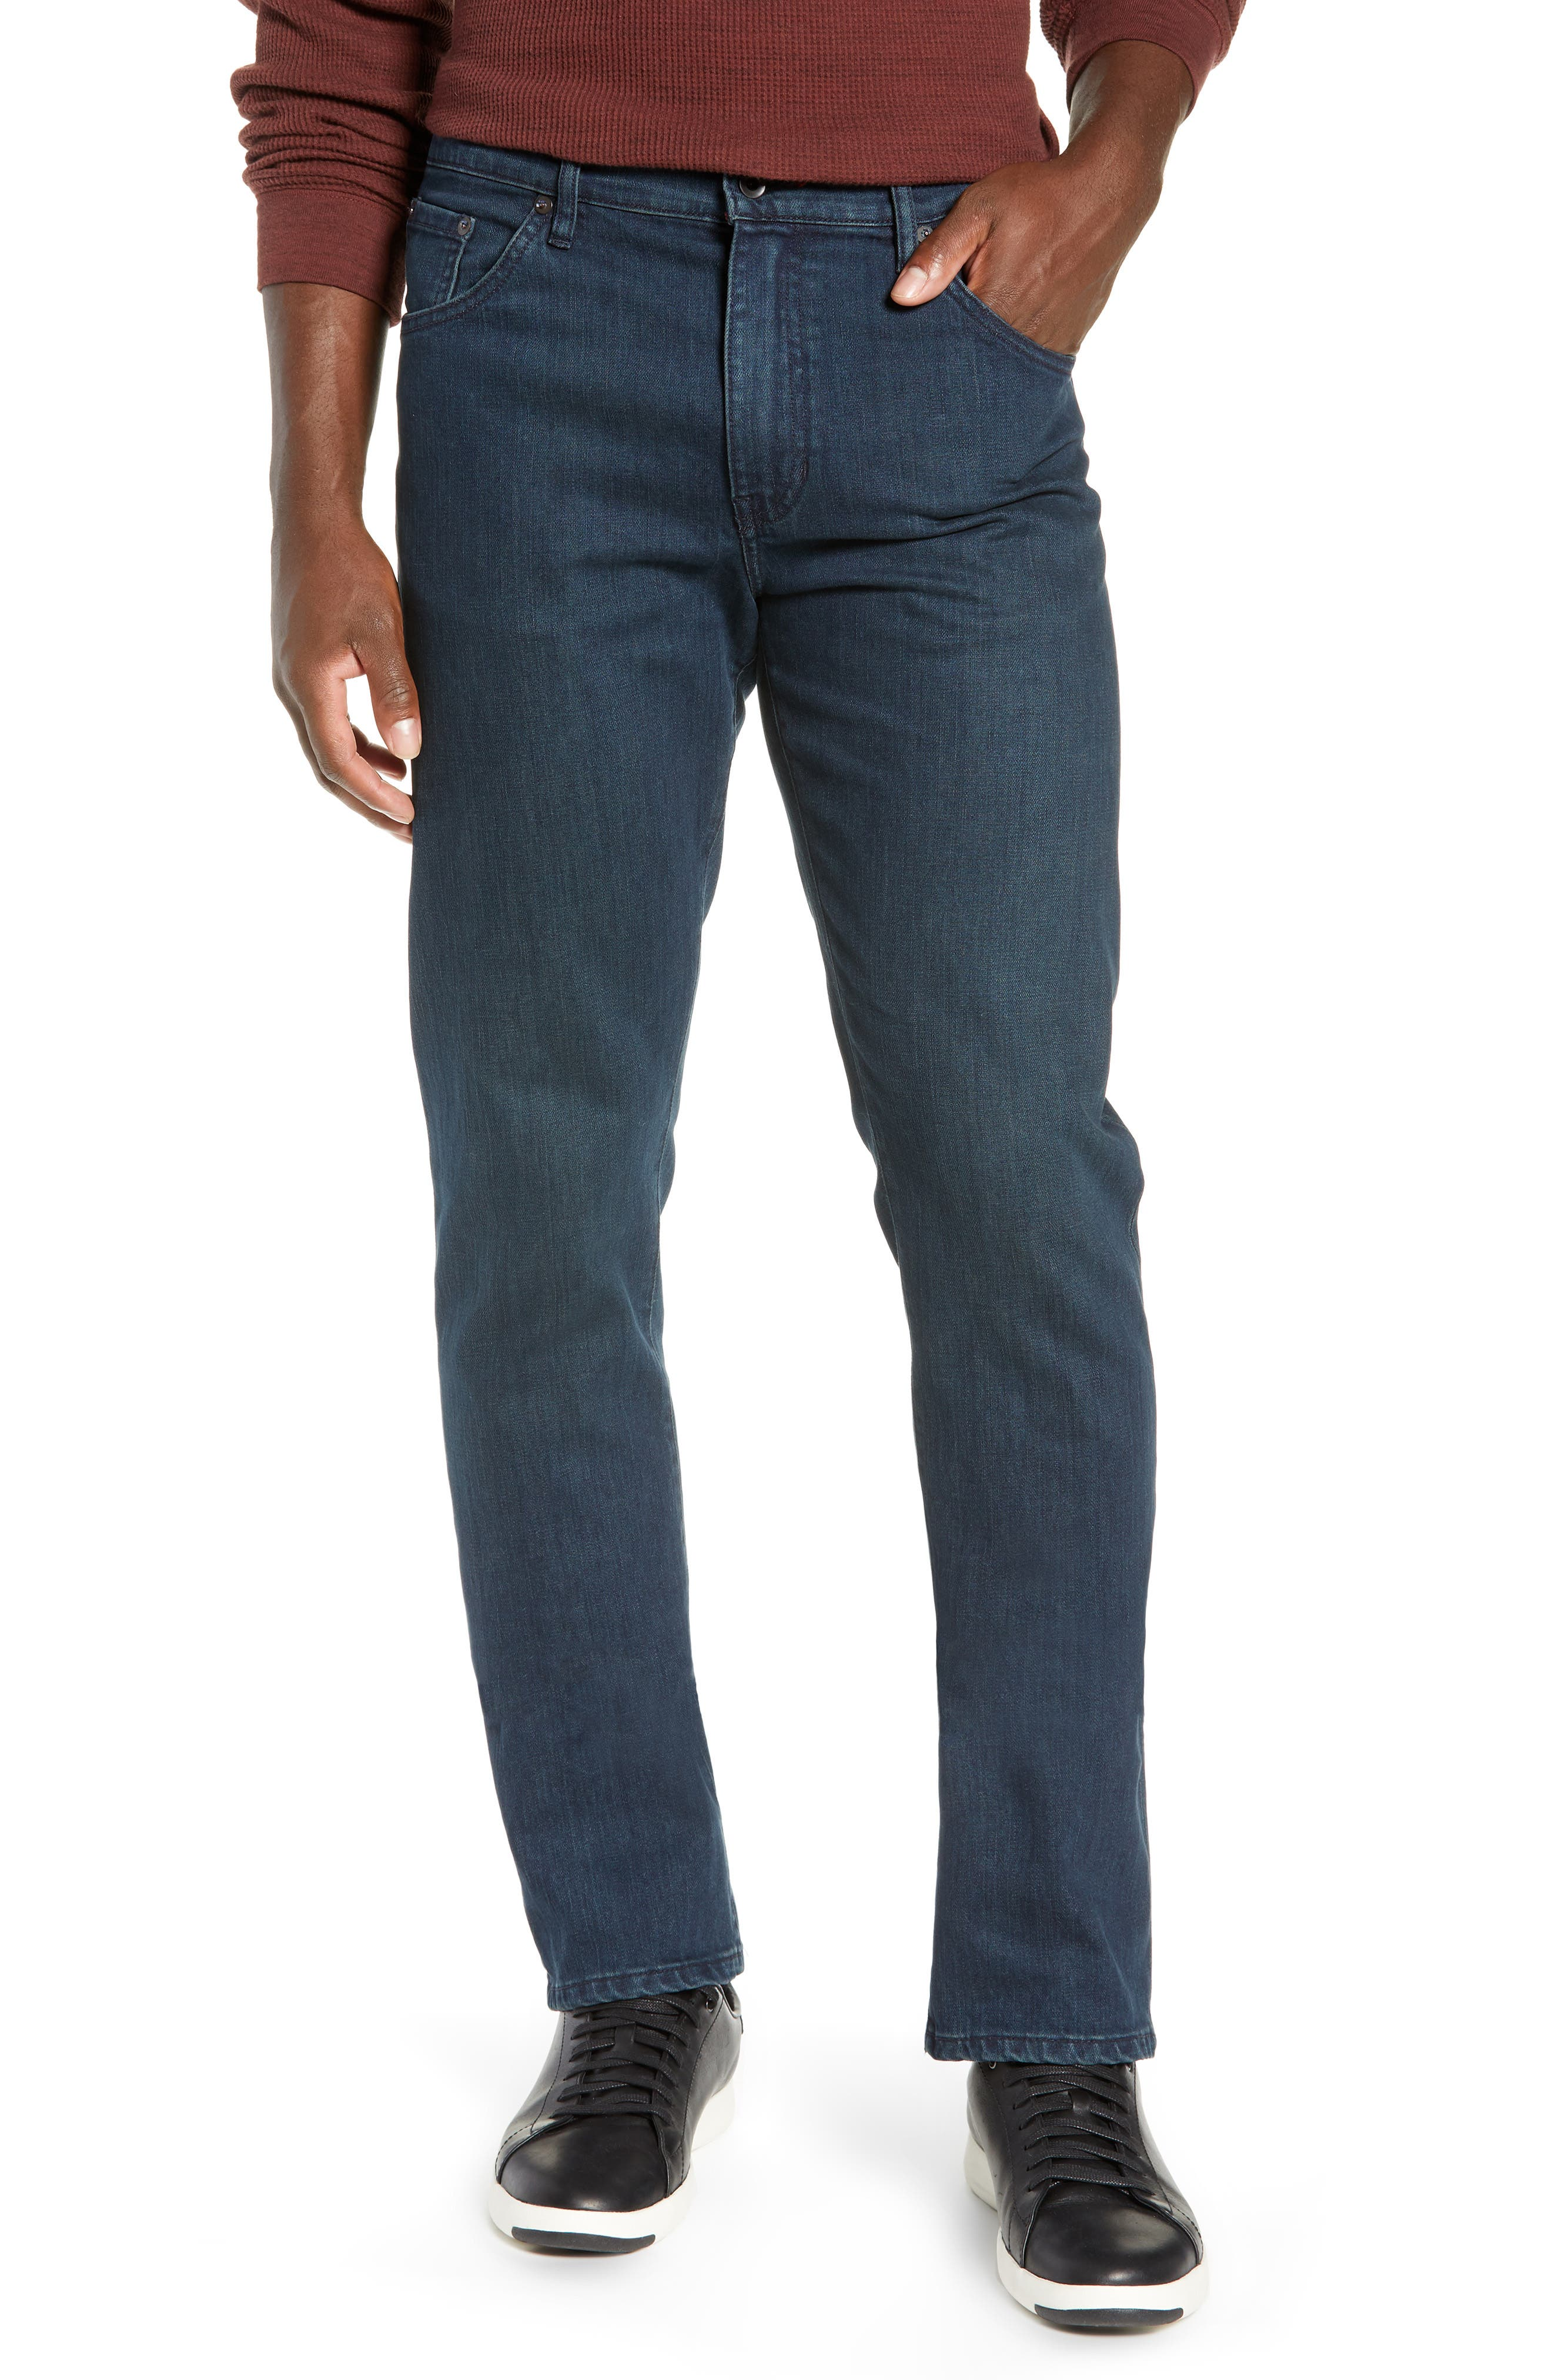 RALEIGH DENIM Jones Slim Fit Jeans in Canon